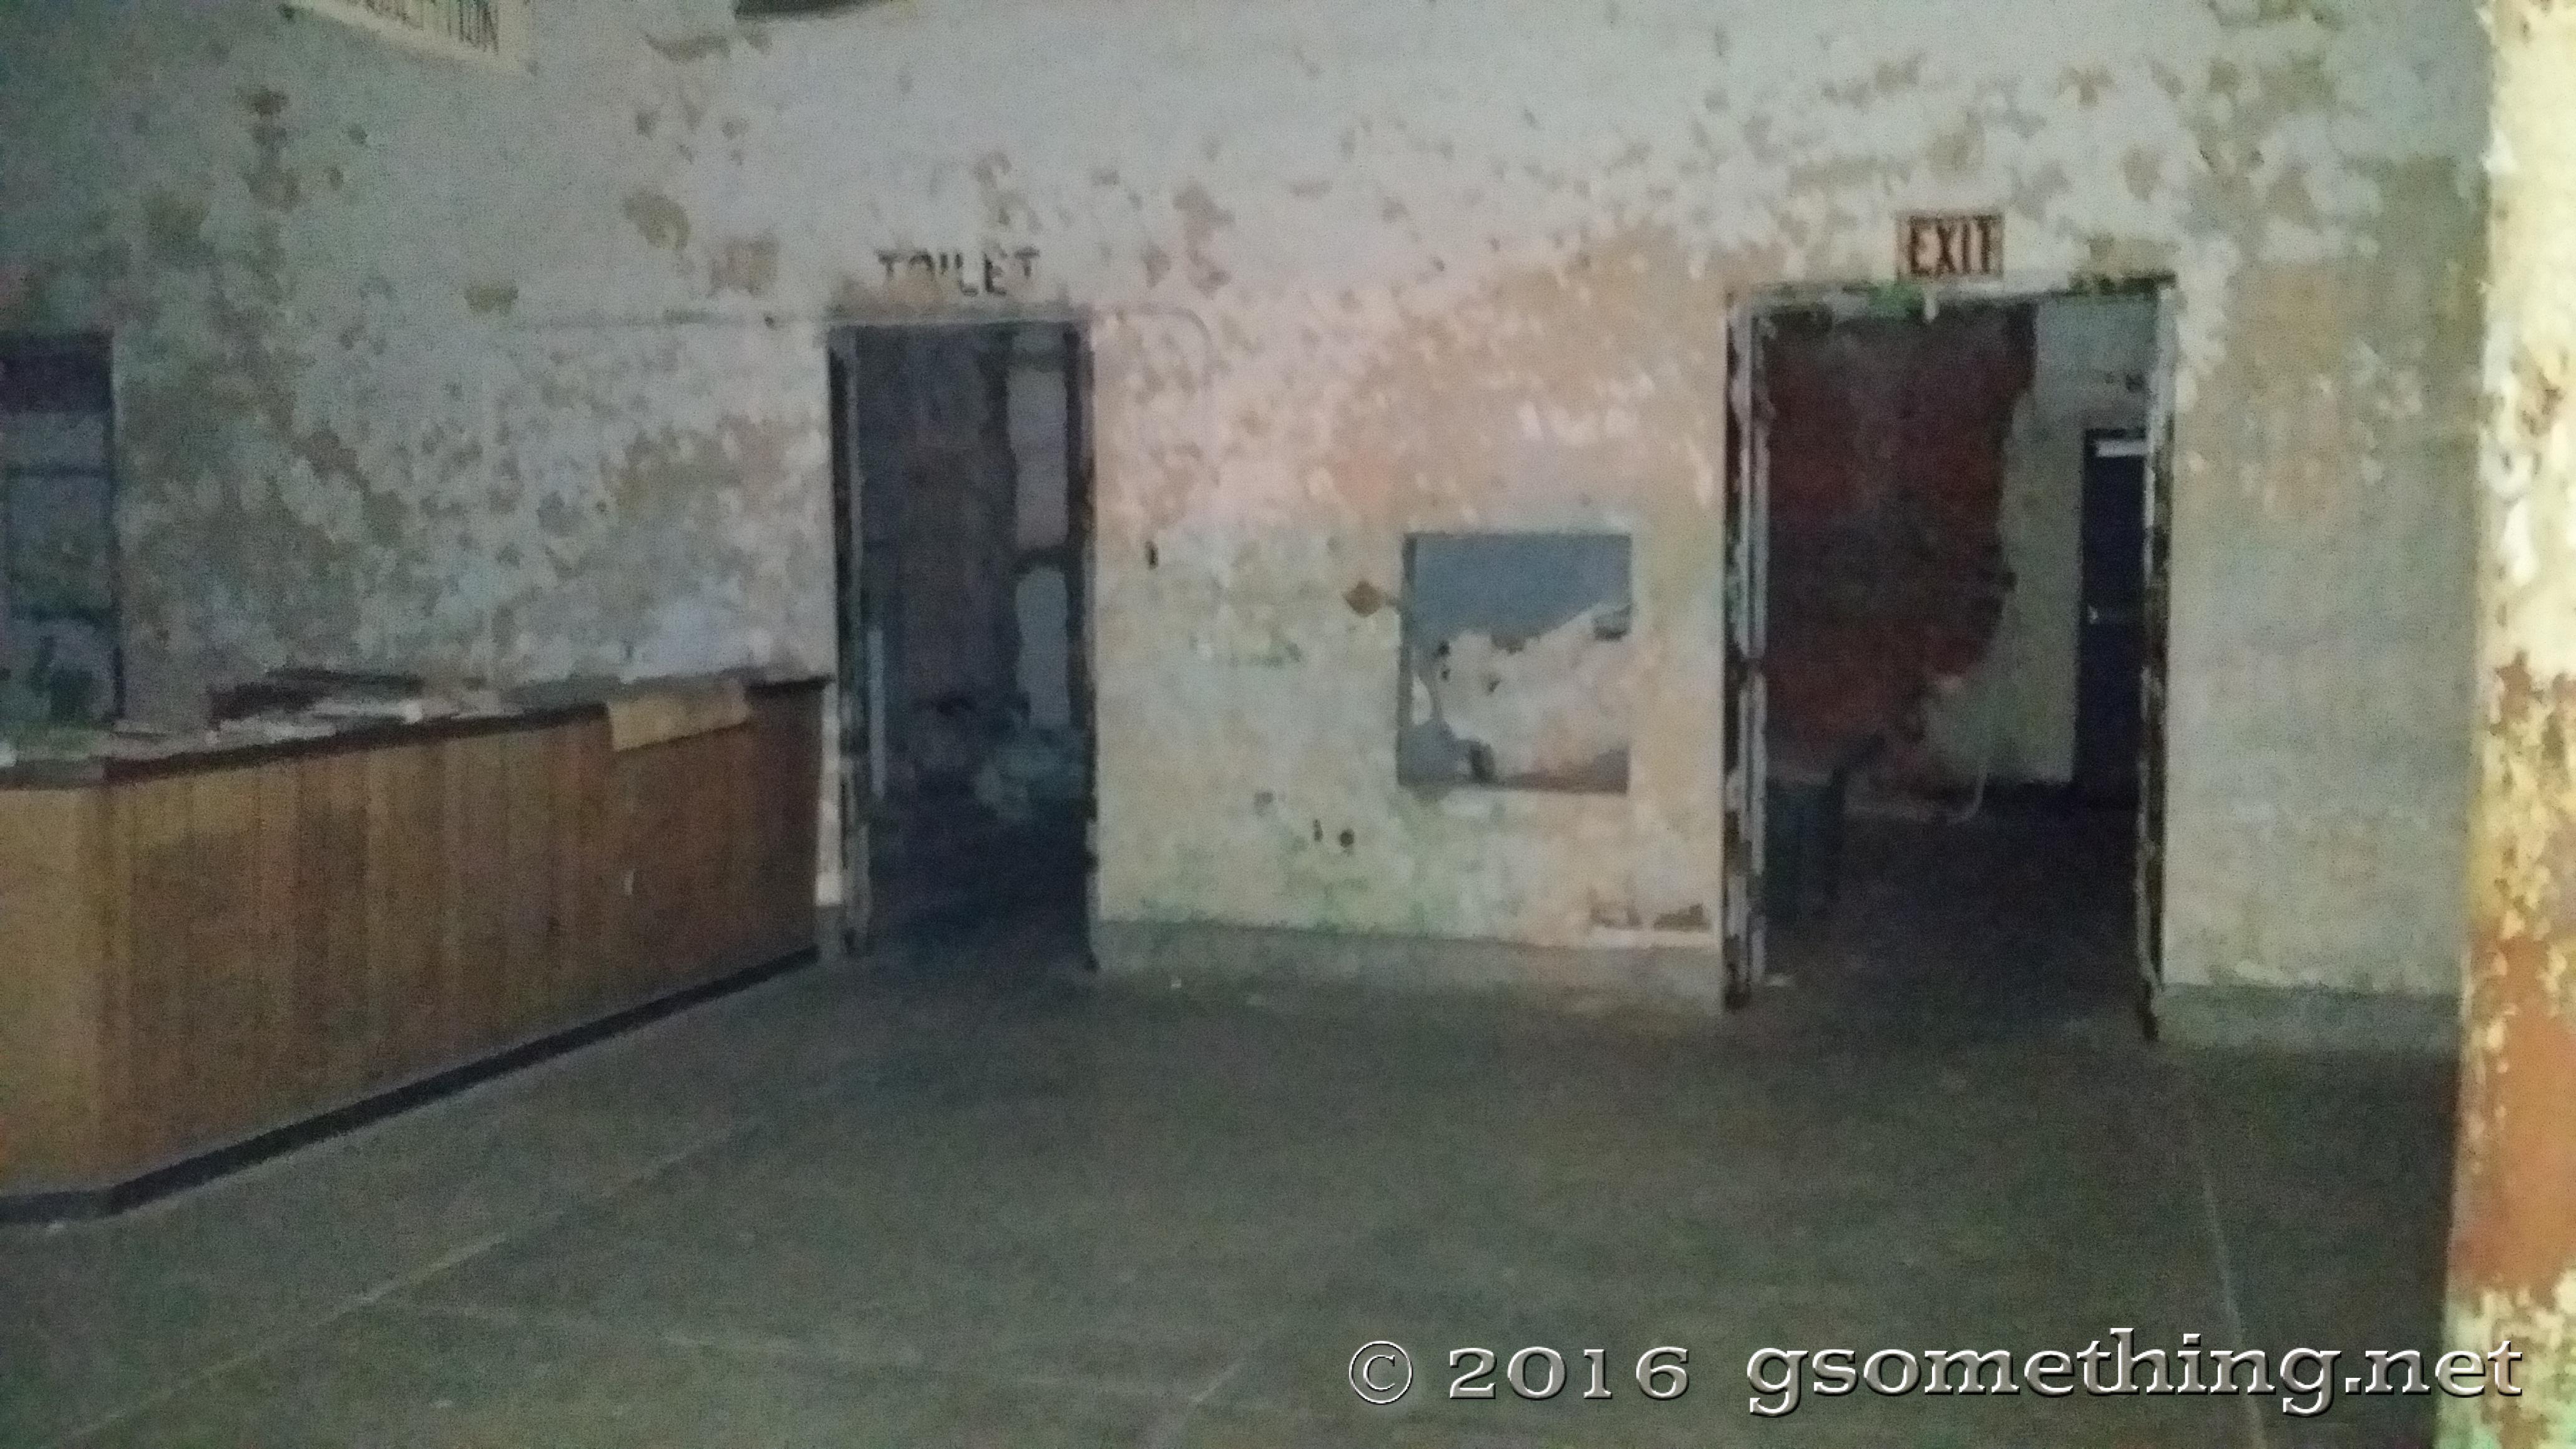 mansfield_reformatory_2nd_trip_181.jpg